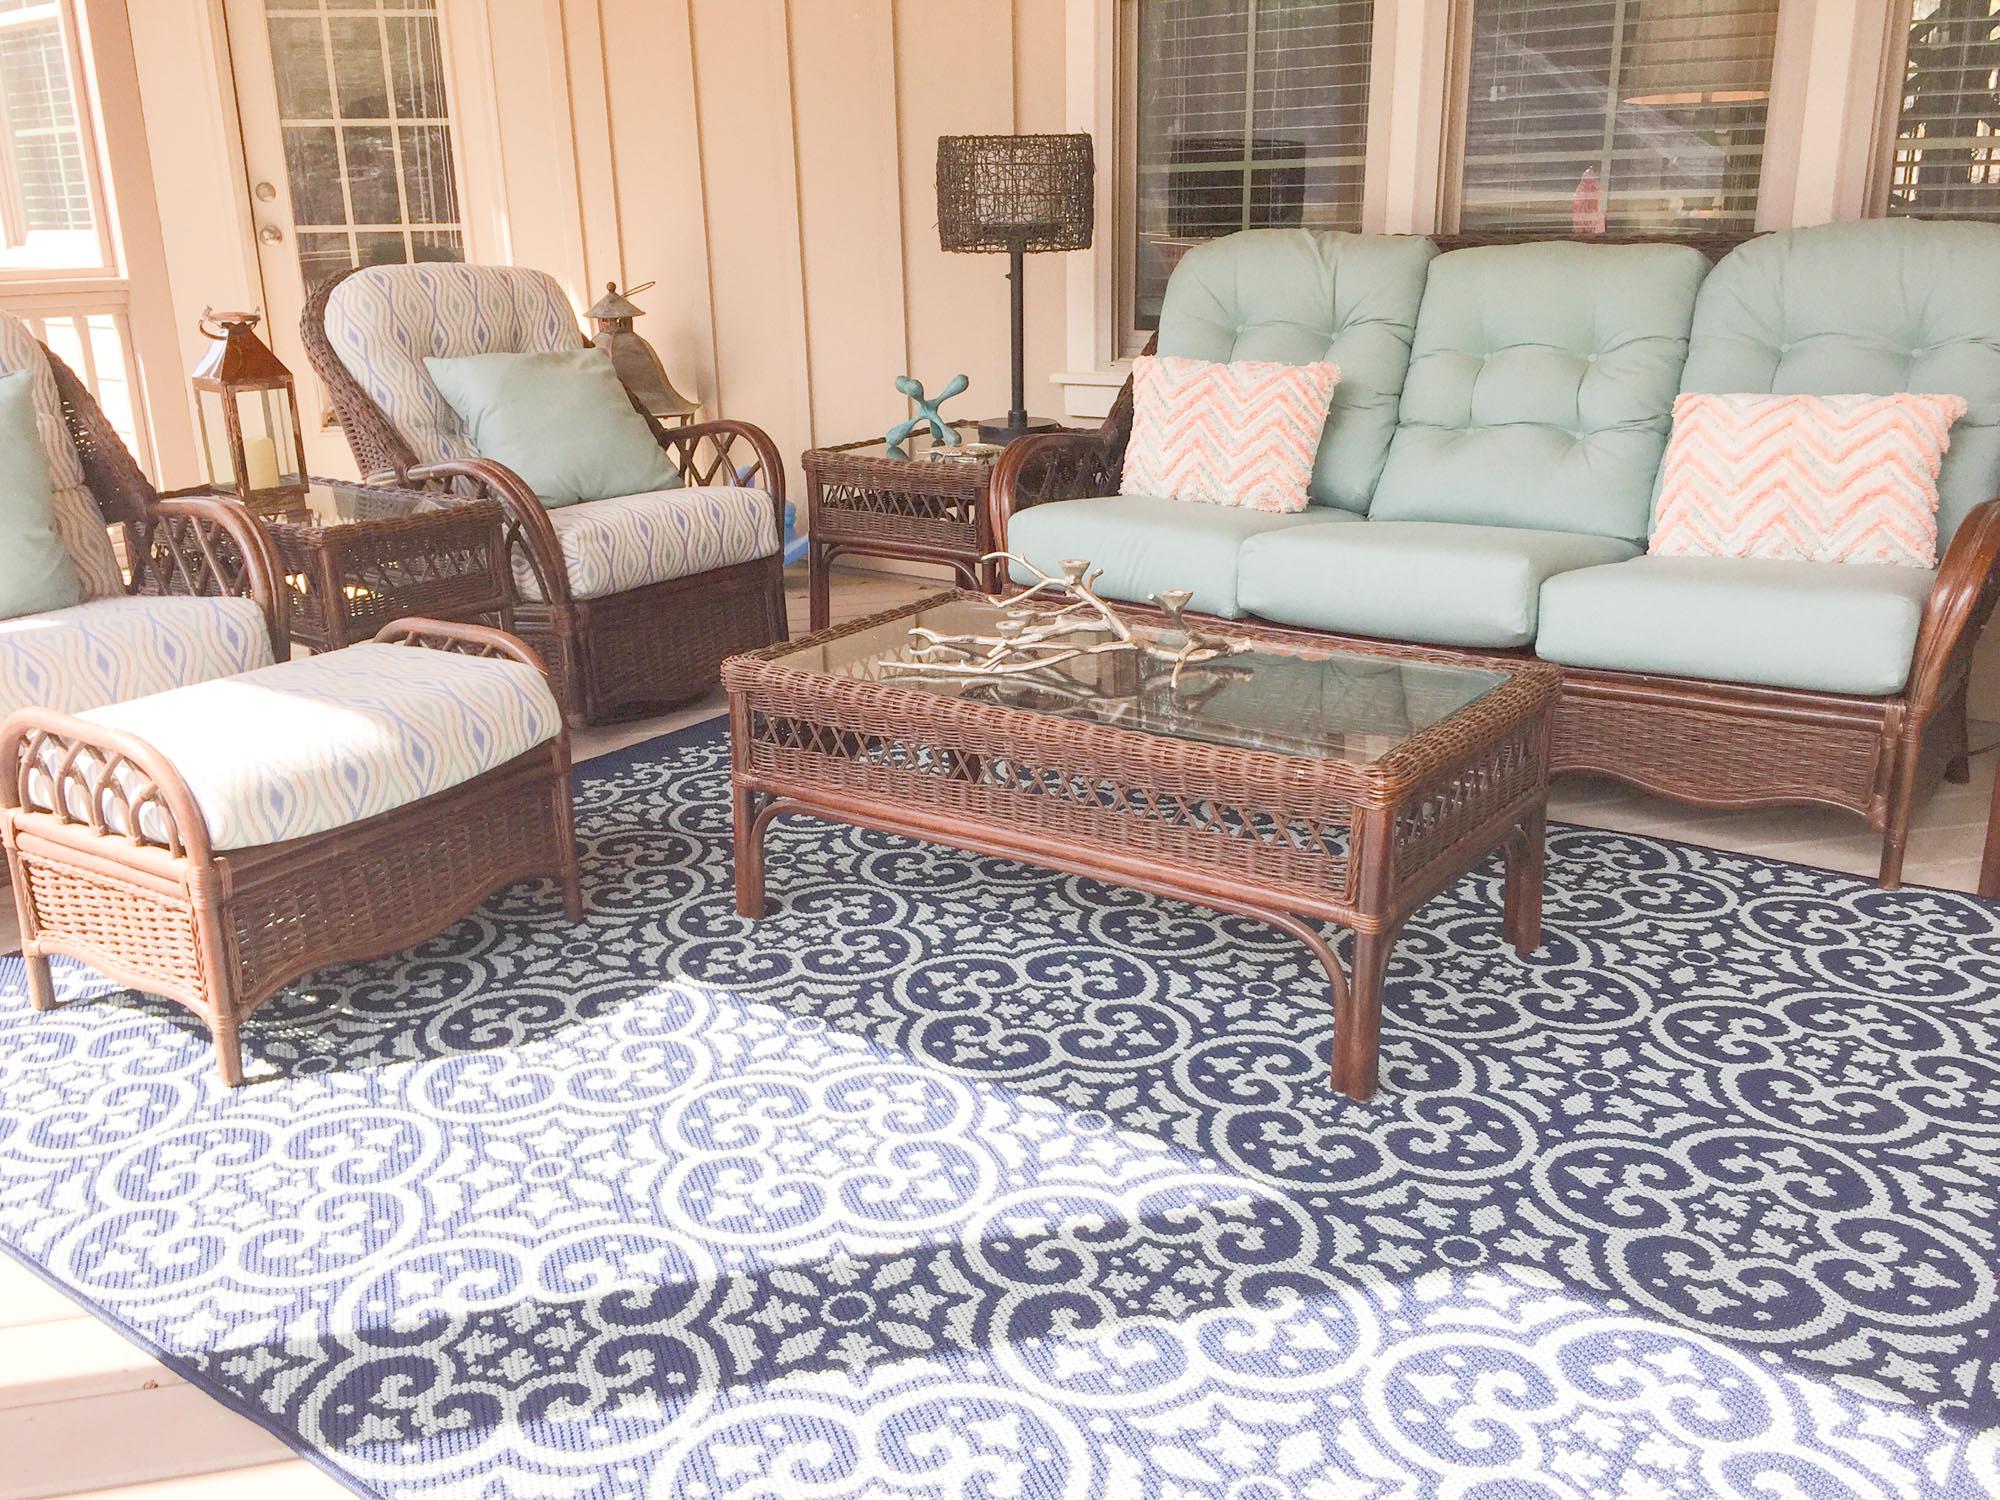 Outdoor furniture with Sunbrella cushions